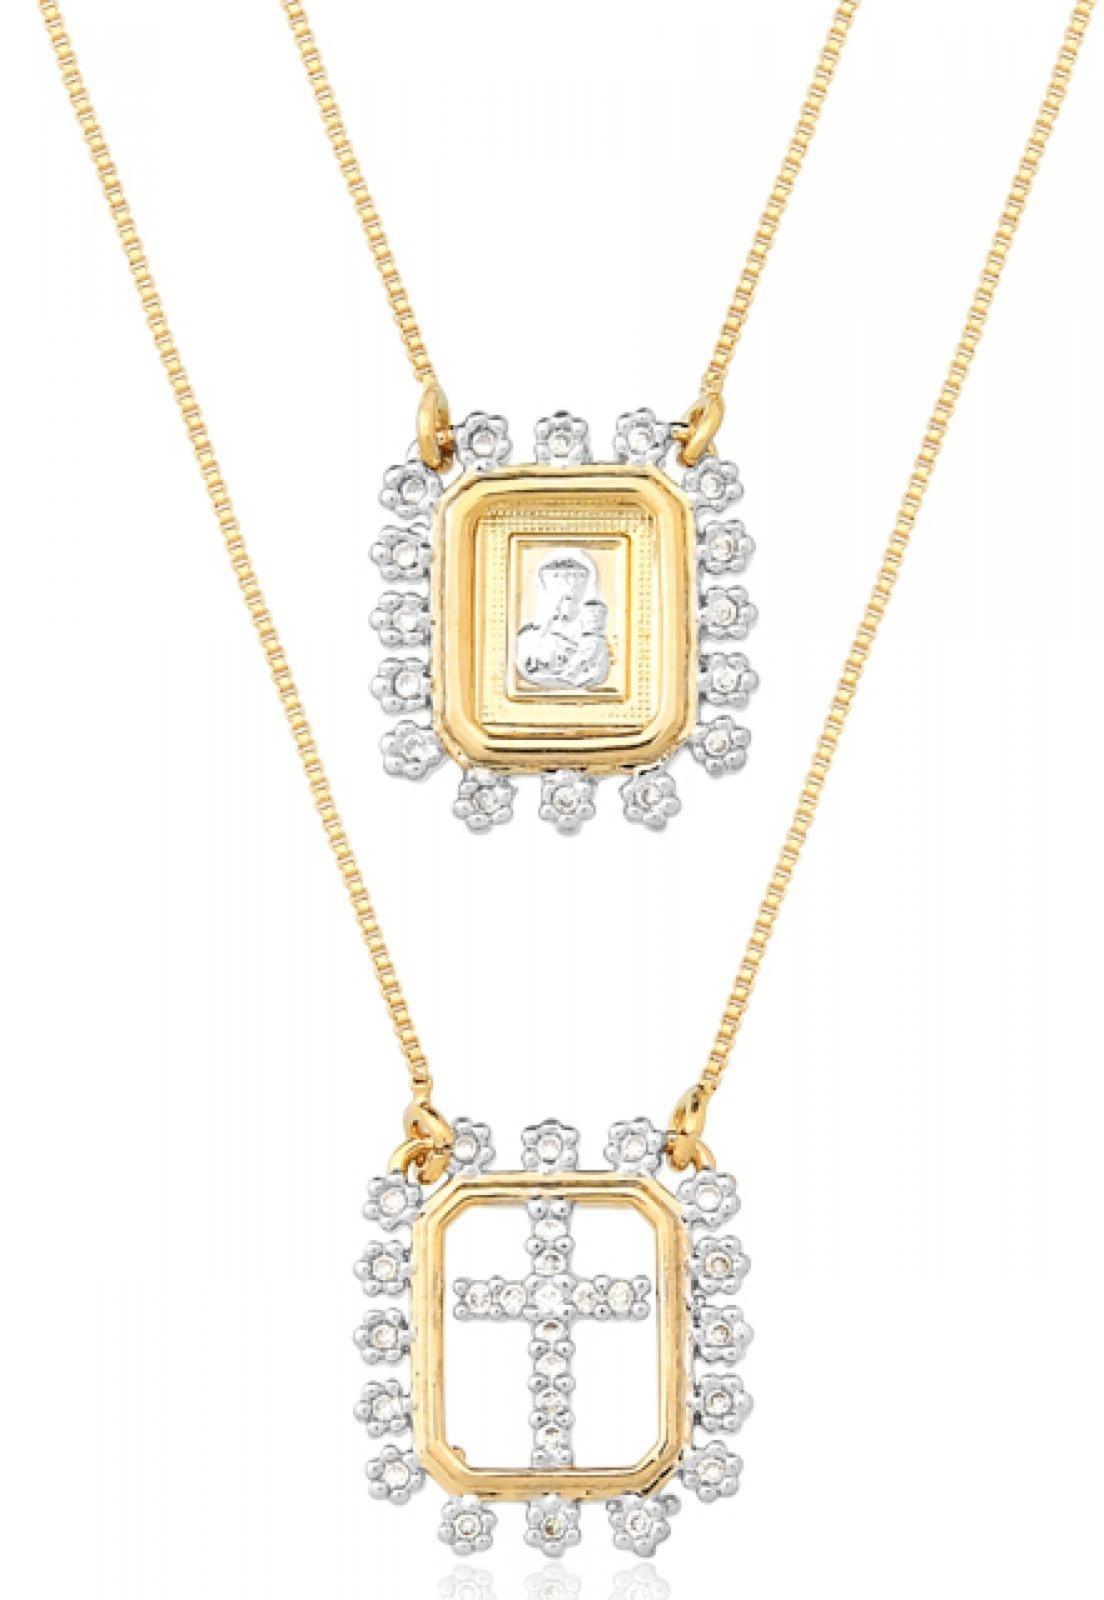 Escapulário  Le Diamond  Dourado